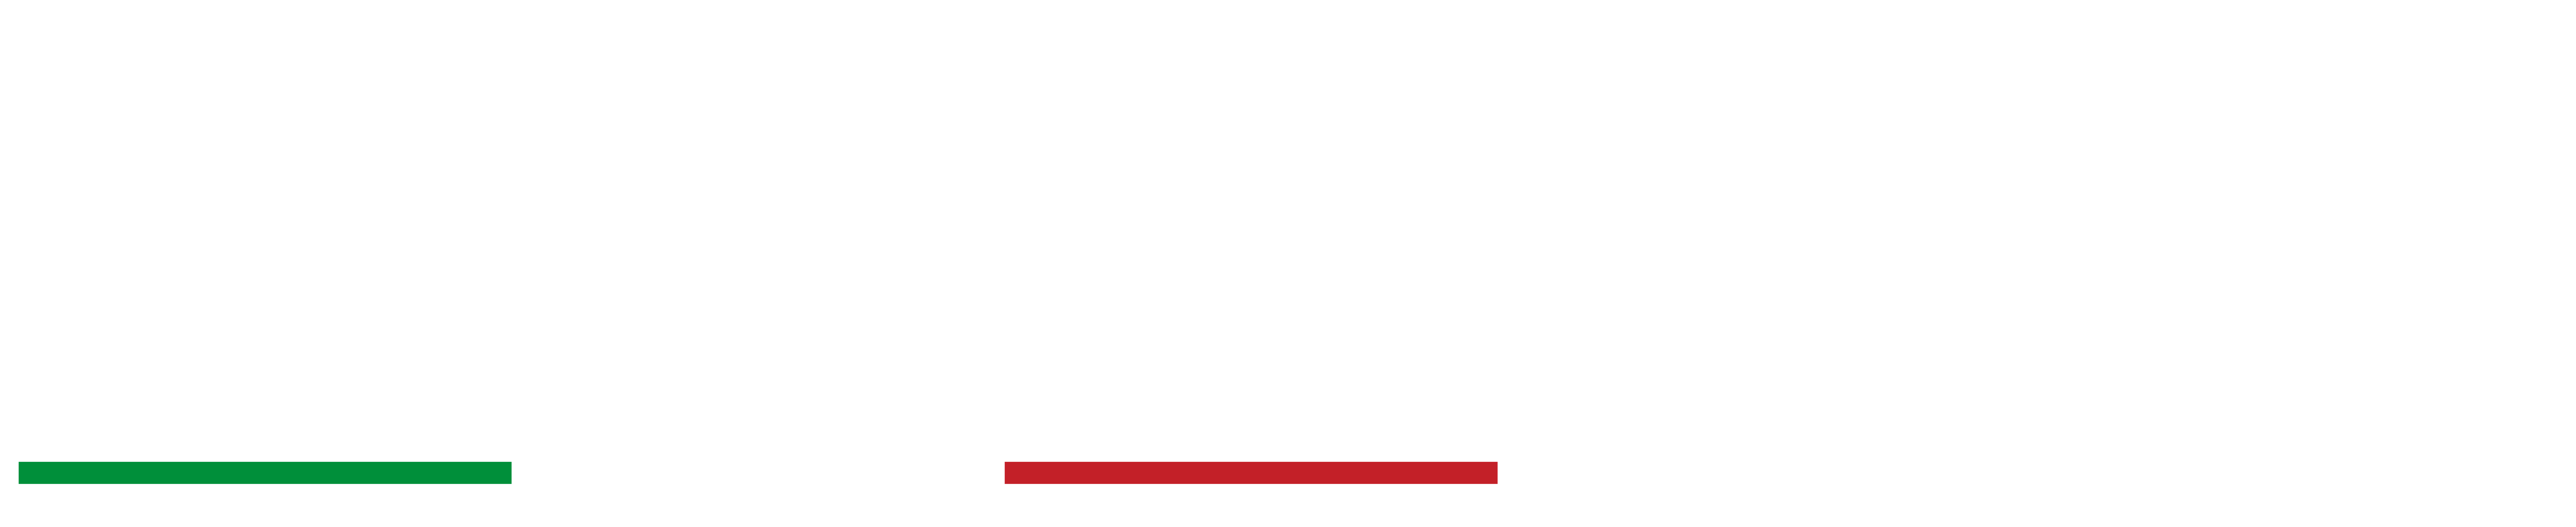 logo bianco joker con bandiera italia